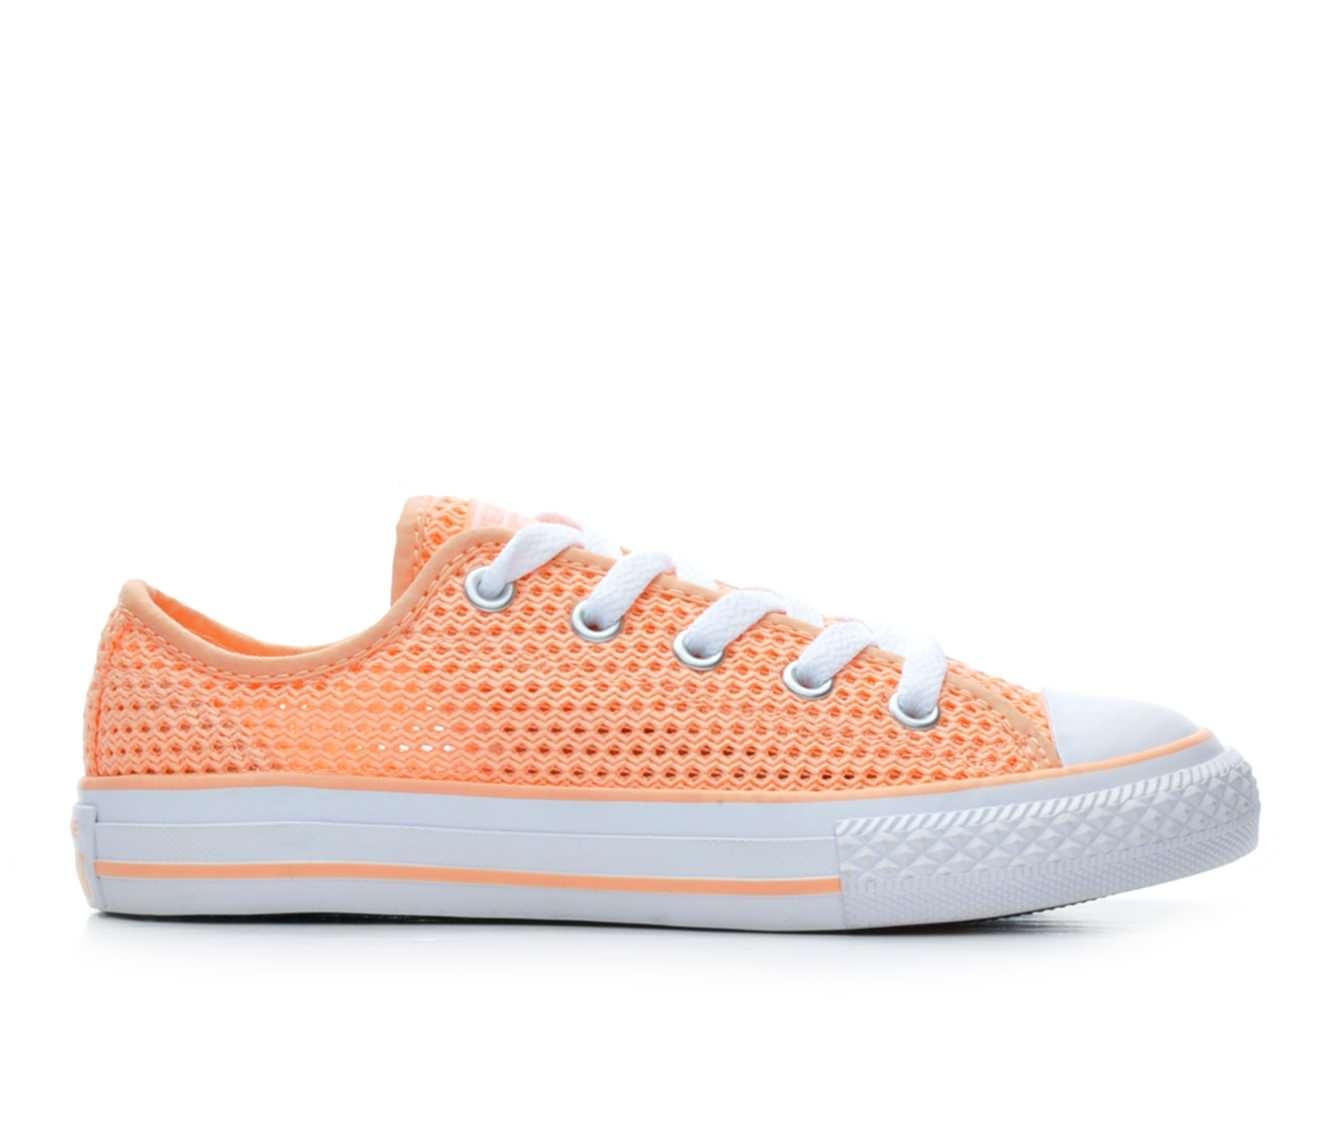 Girls' Converse Chuck Taylor All Star Ox Crochet Sneakers (Orange)